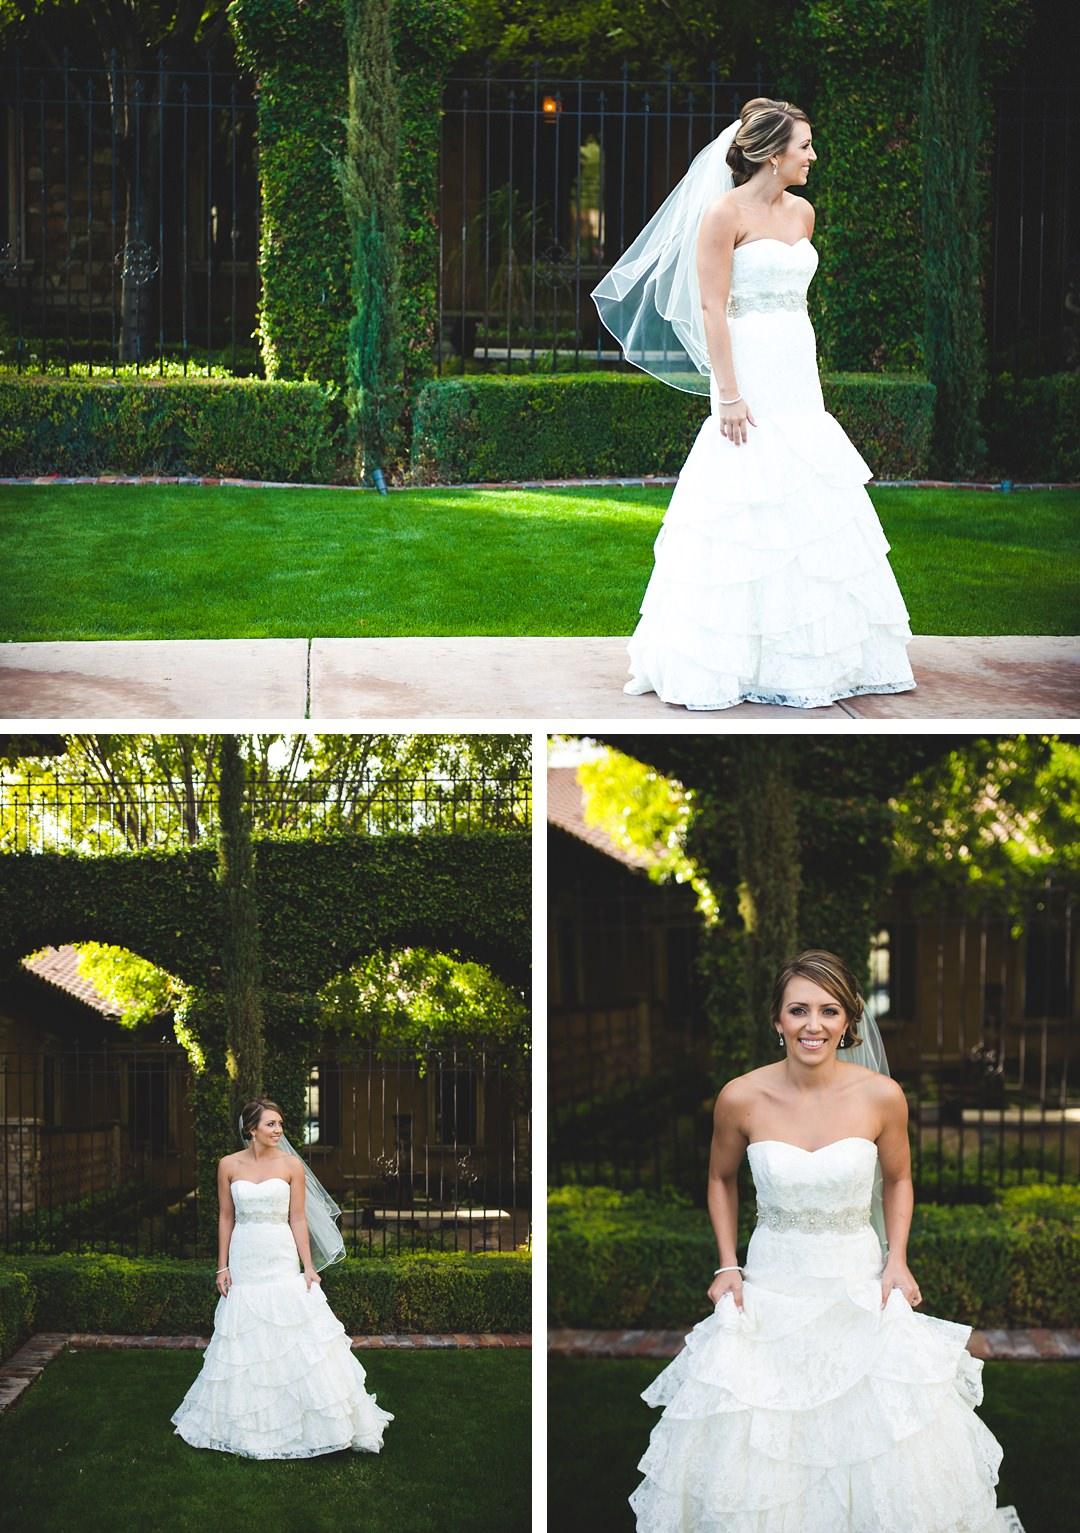 Scott-english-photo-arizona-wedding-photographer_0018.jpg